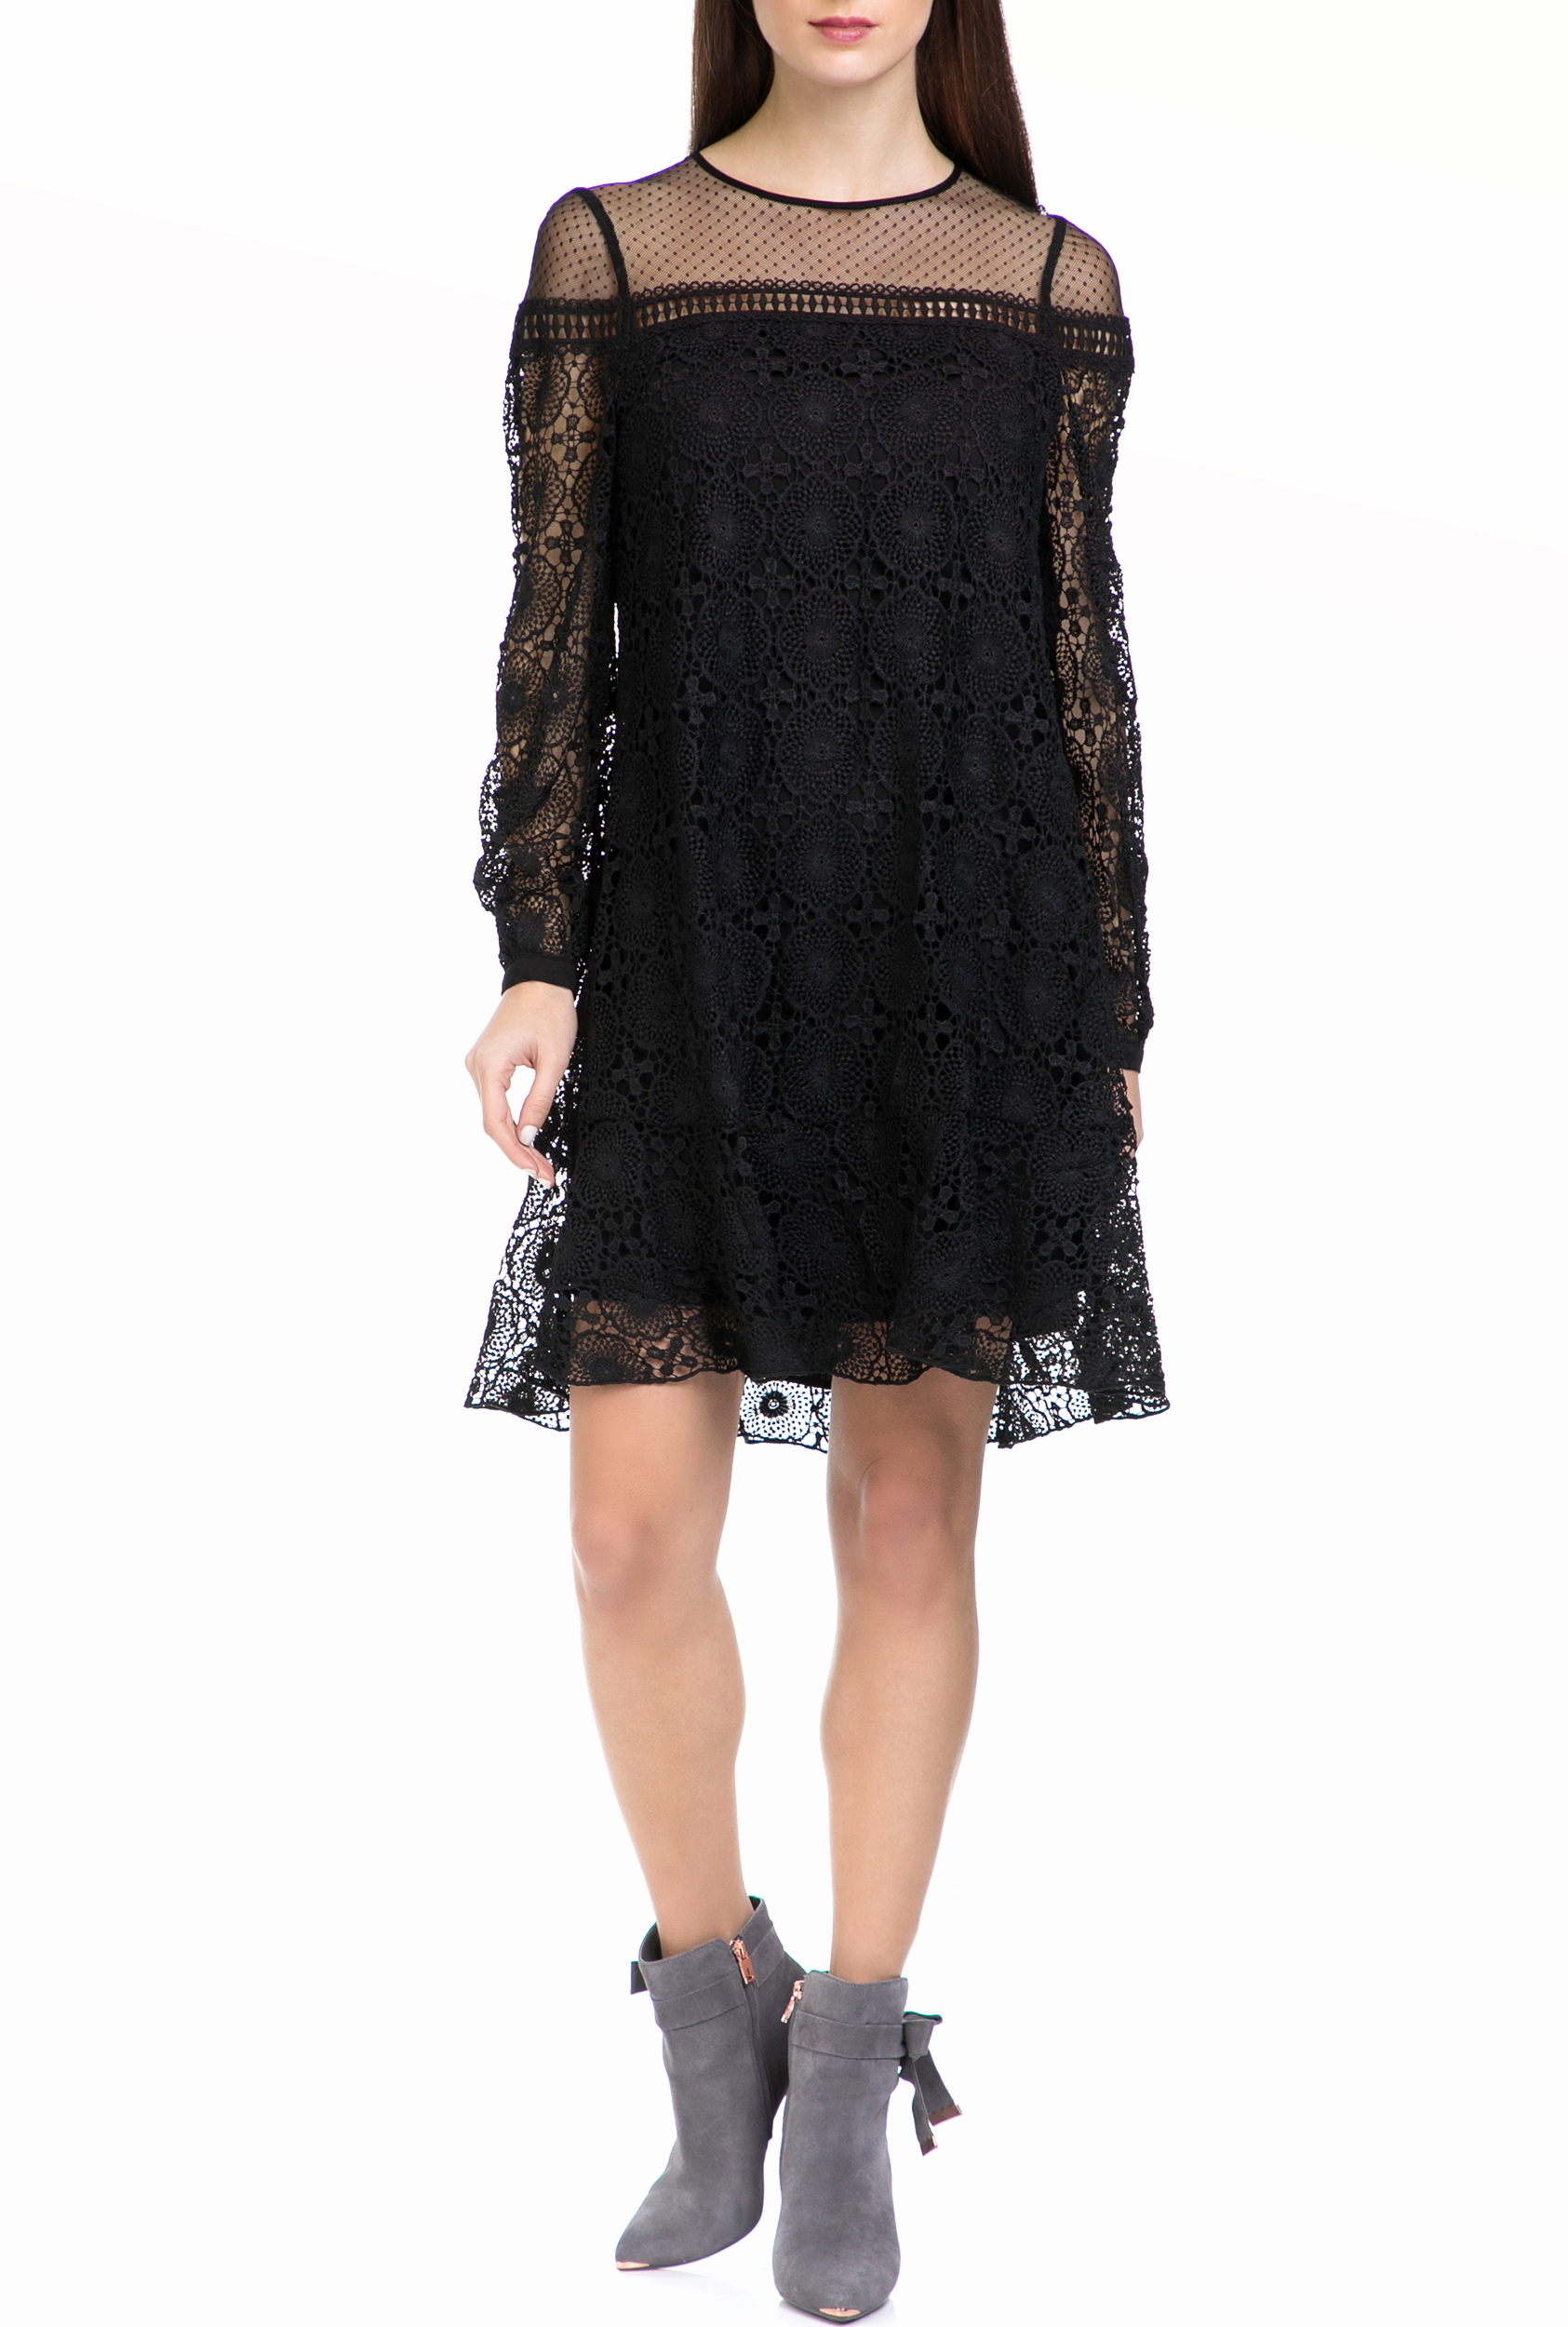 HALE BOB - Γυναικείο φόρεμα HALE BOB μαύρο γυναικεία ρούχα φόρεματα μίνι